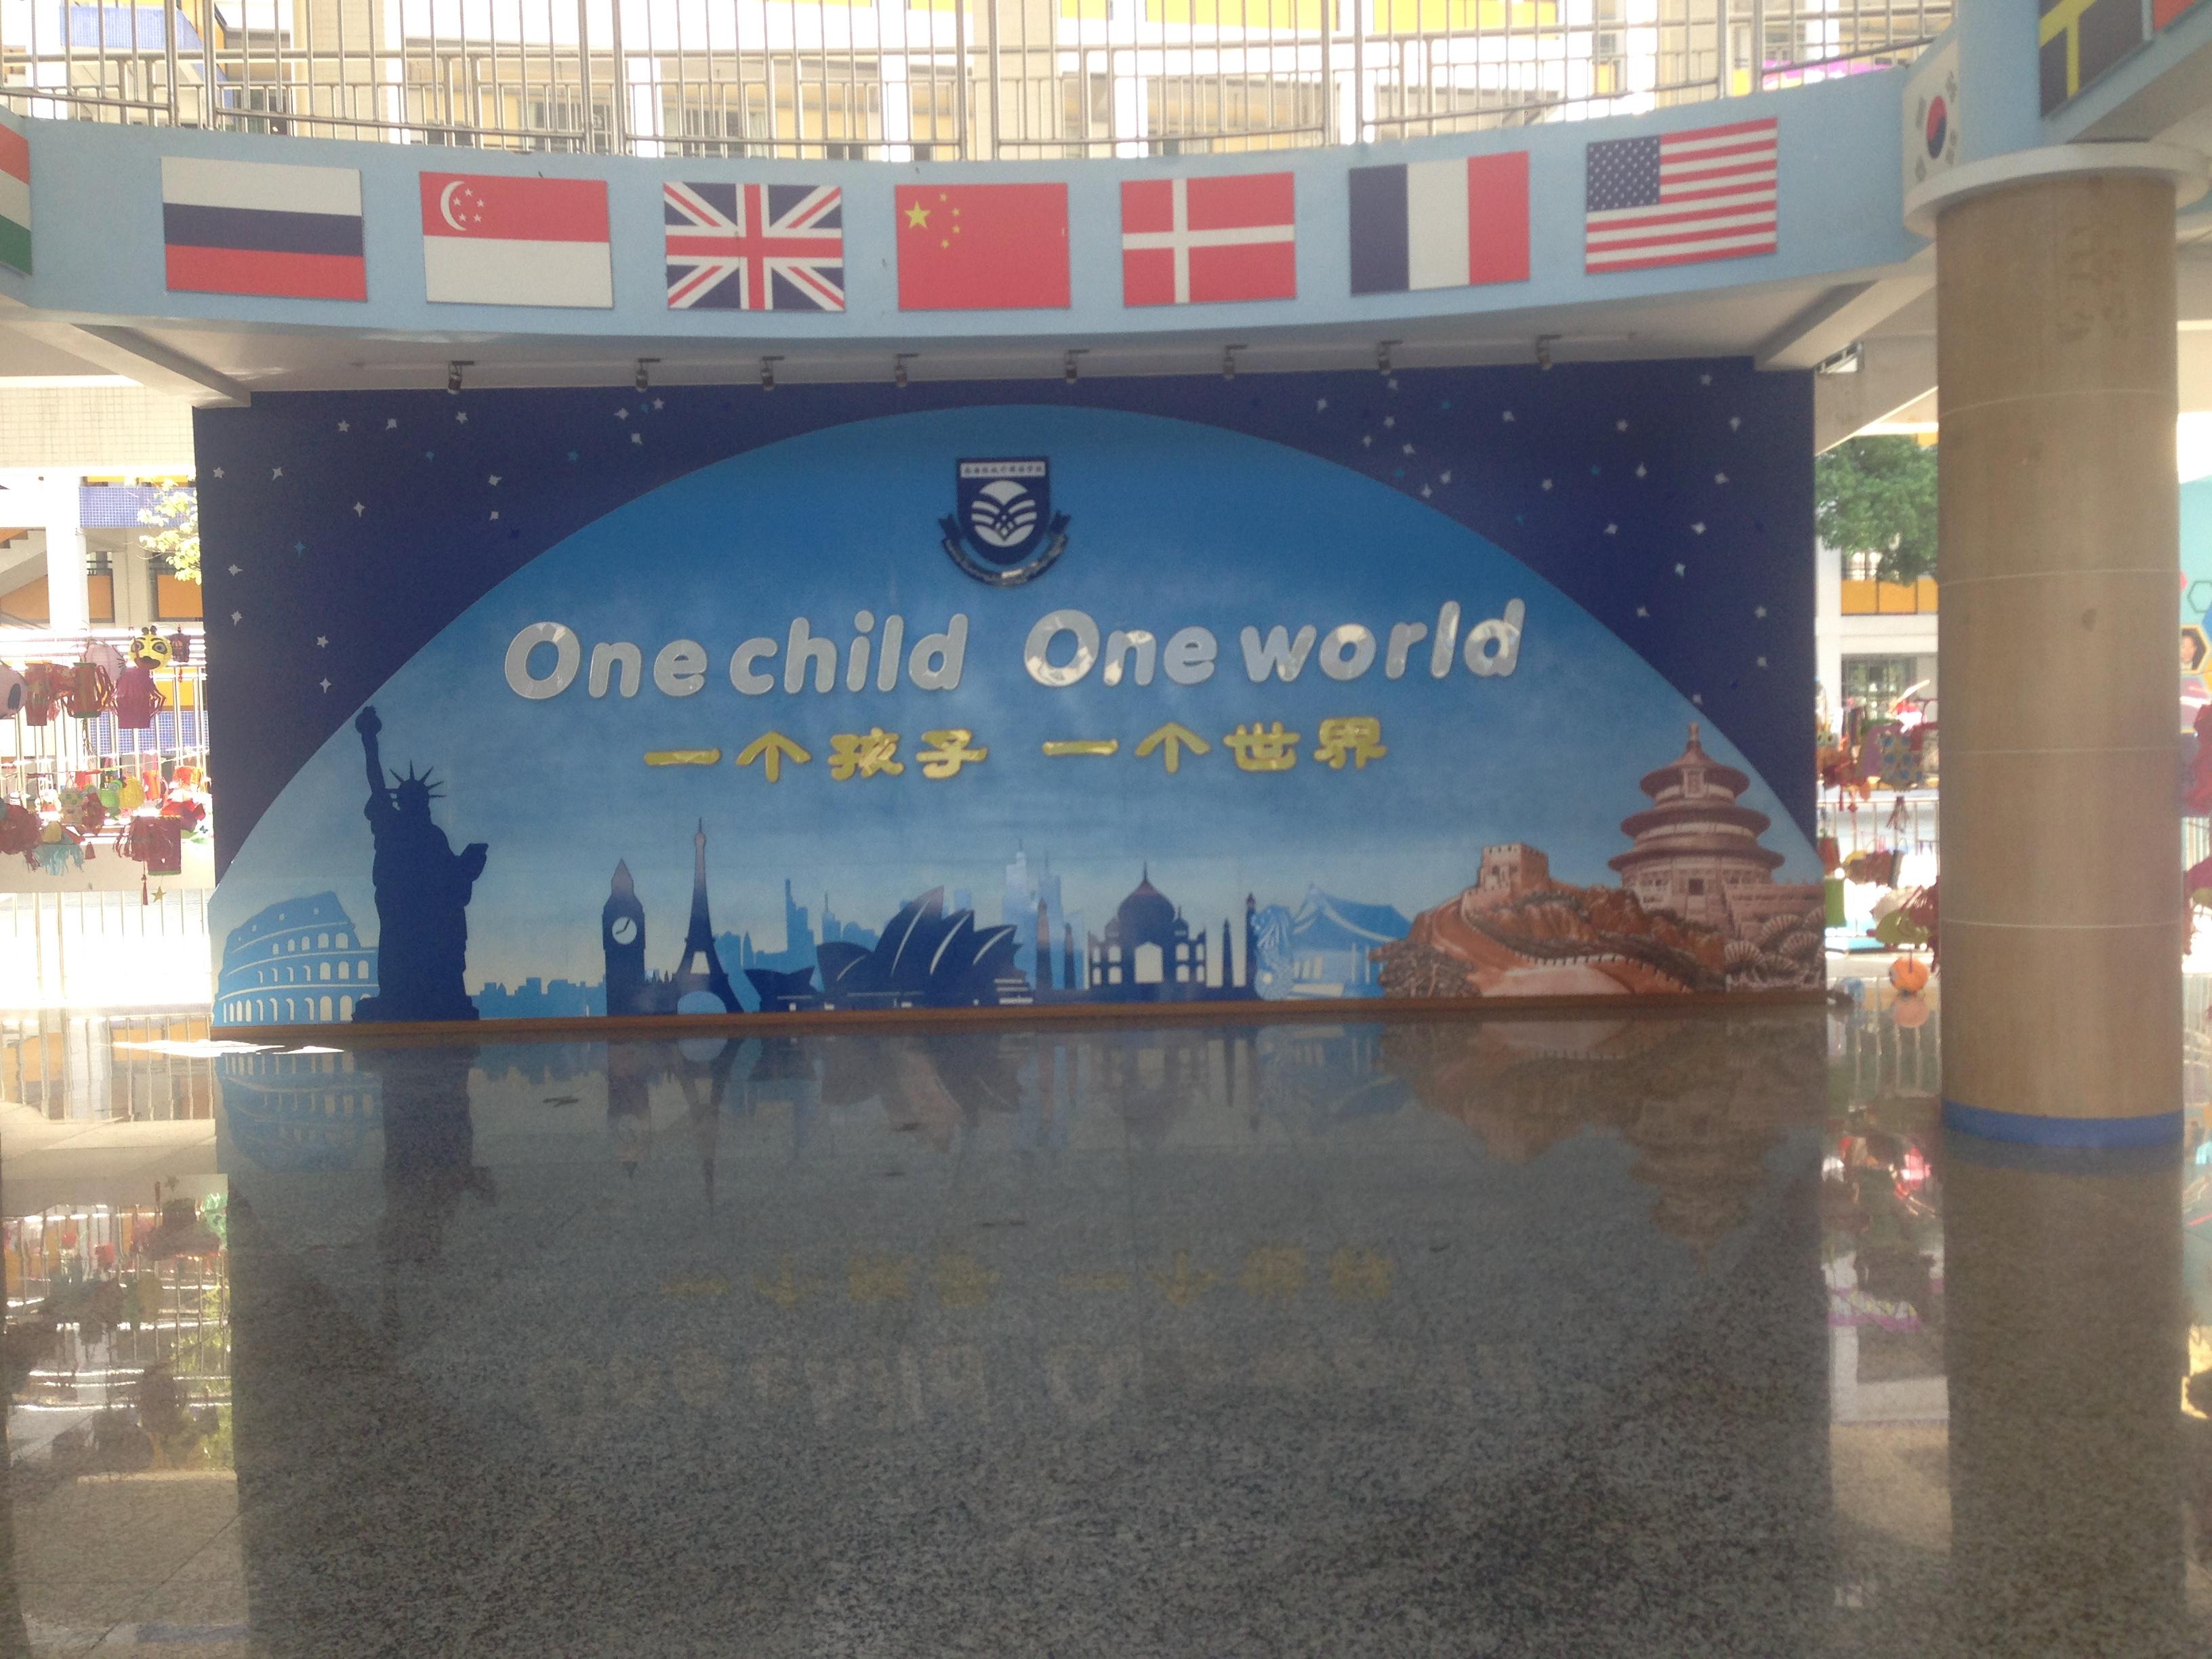 Wall mural at school in Foshan, China